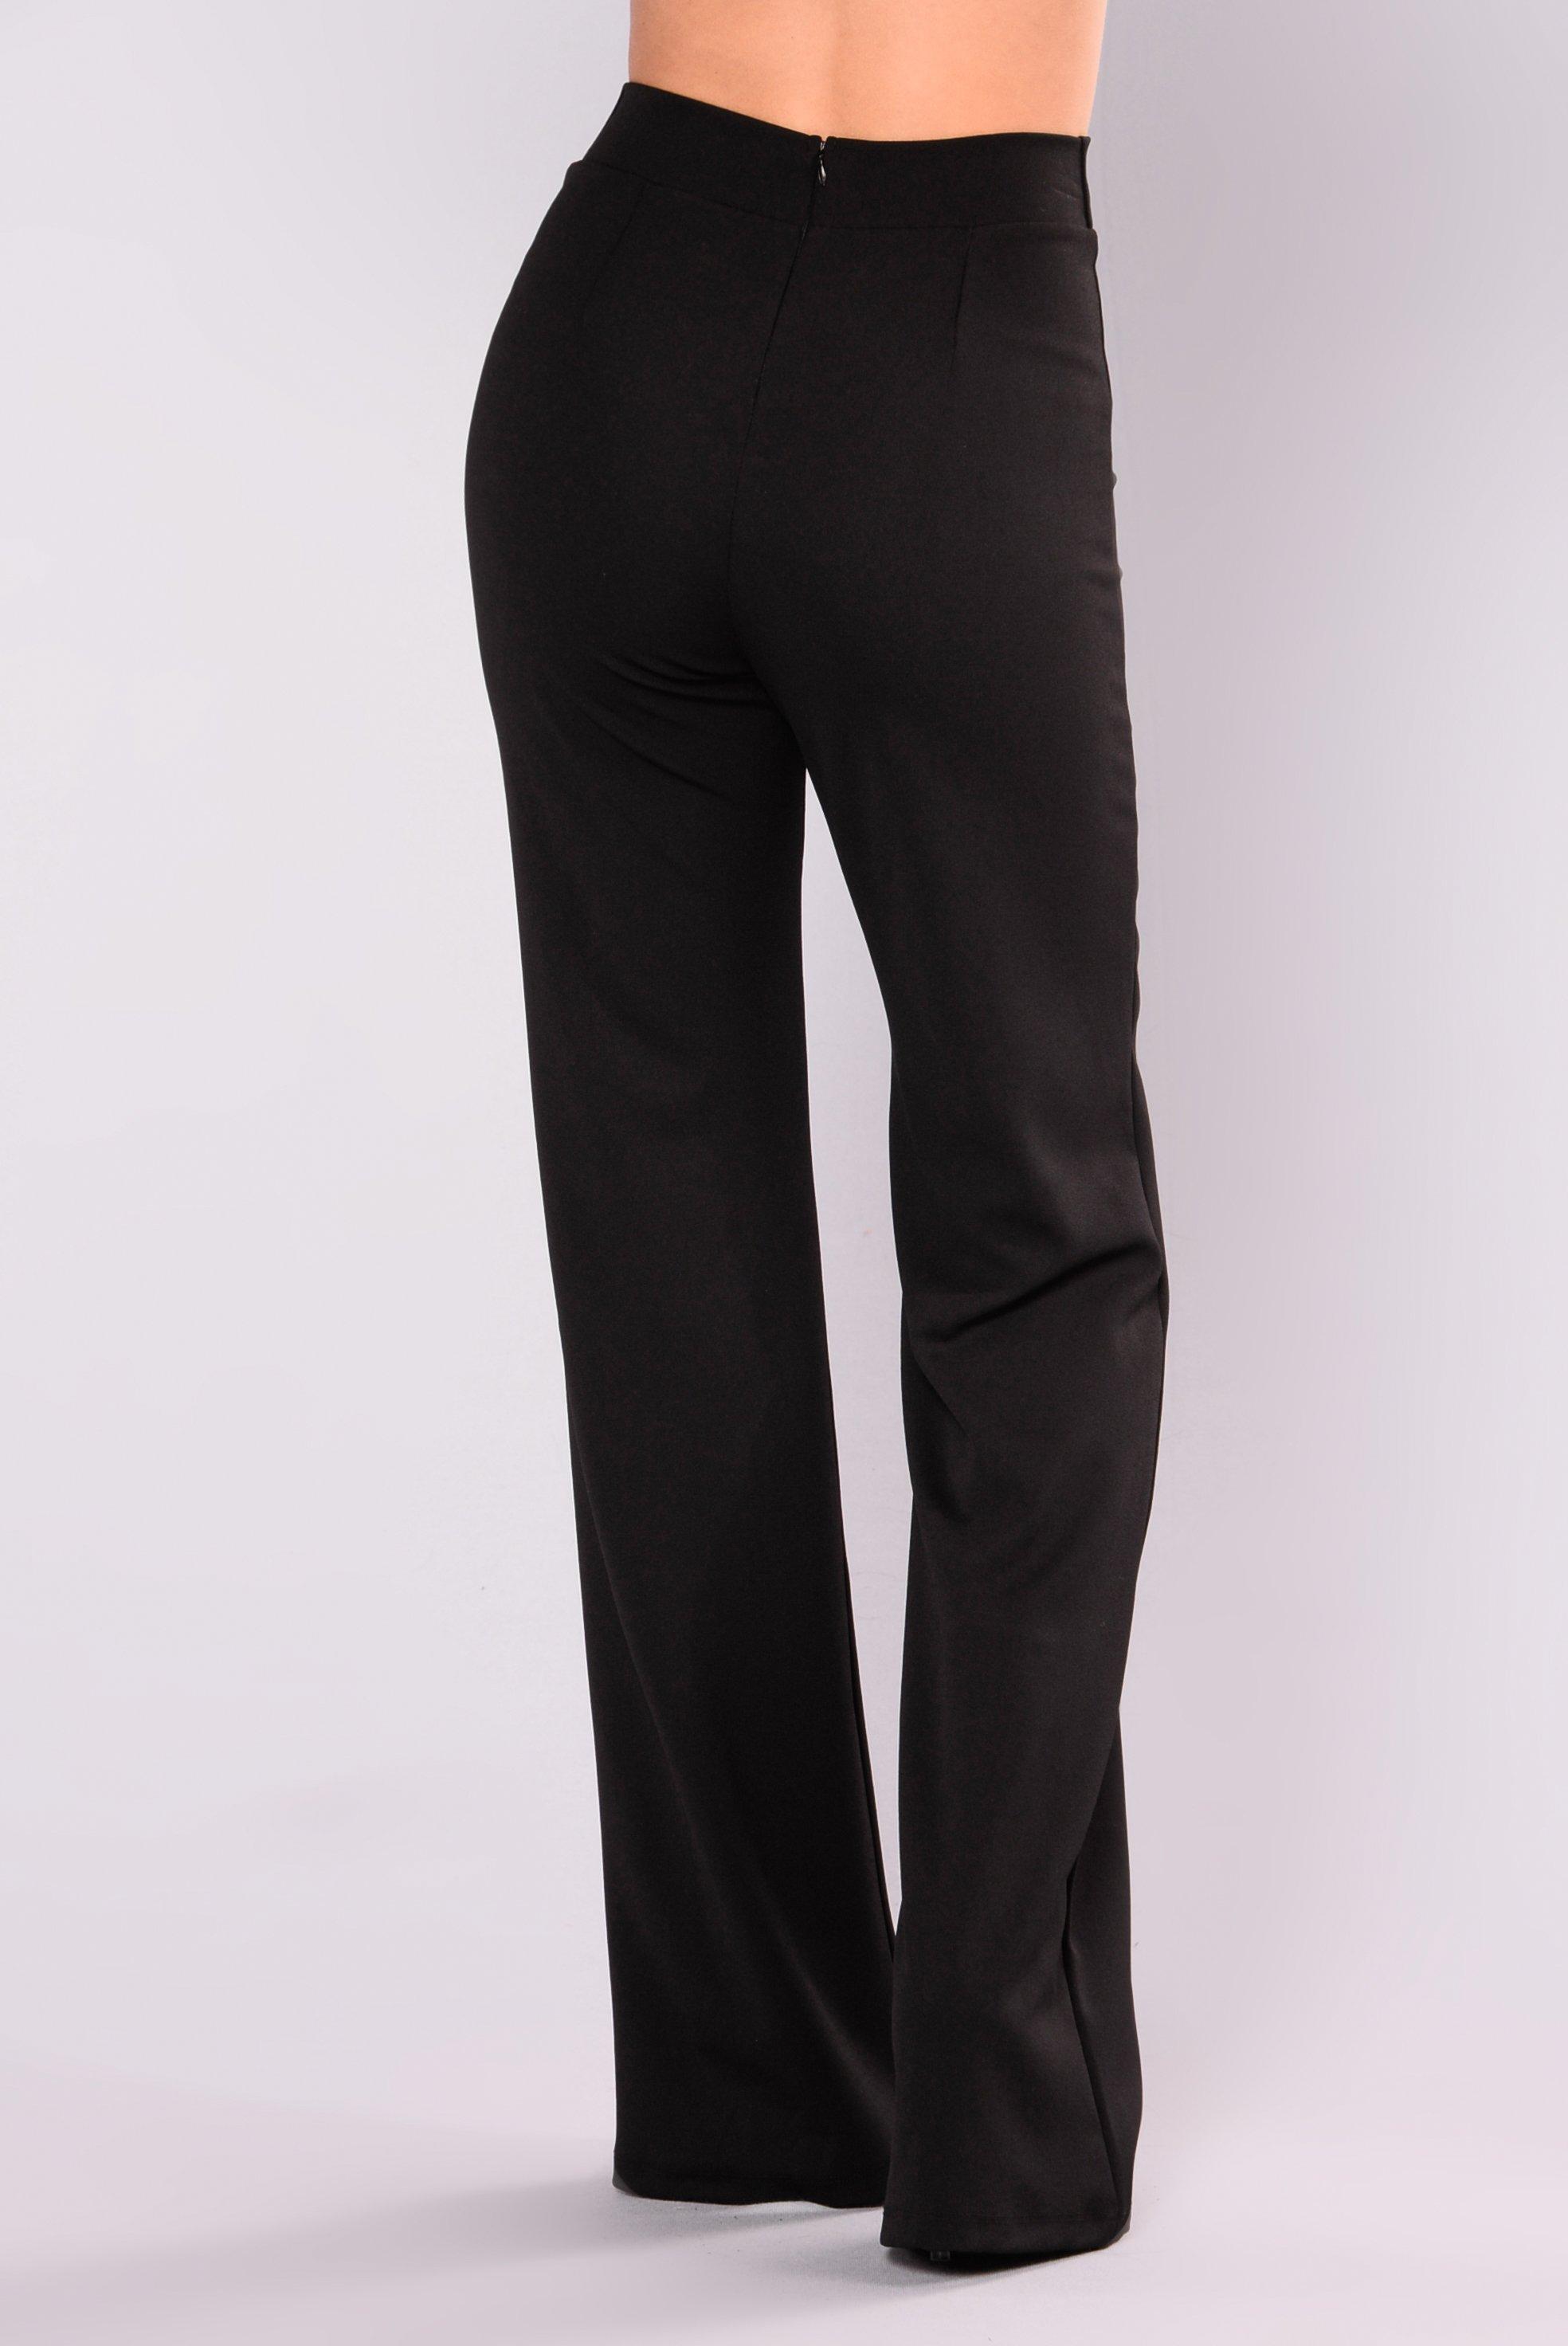 Black Dress Pants victoria high waisted dress pants - black LGBHKPO